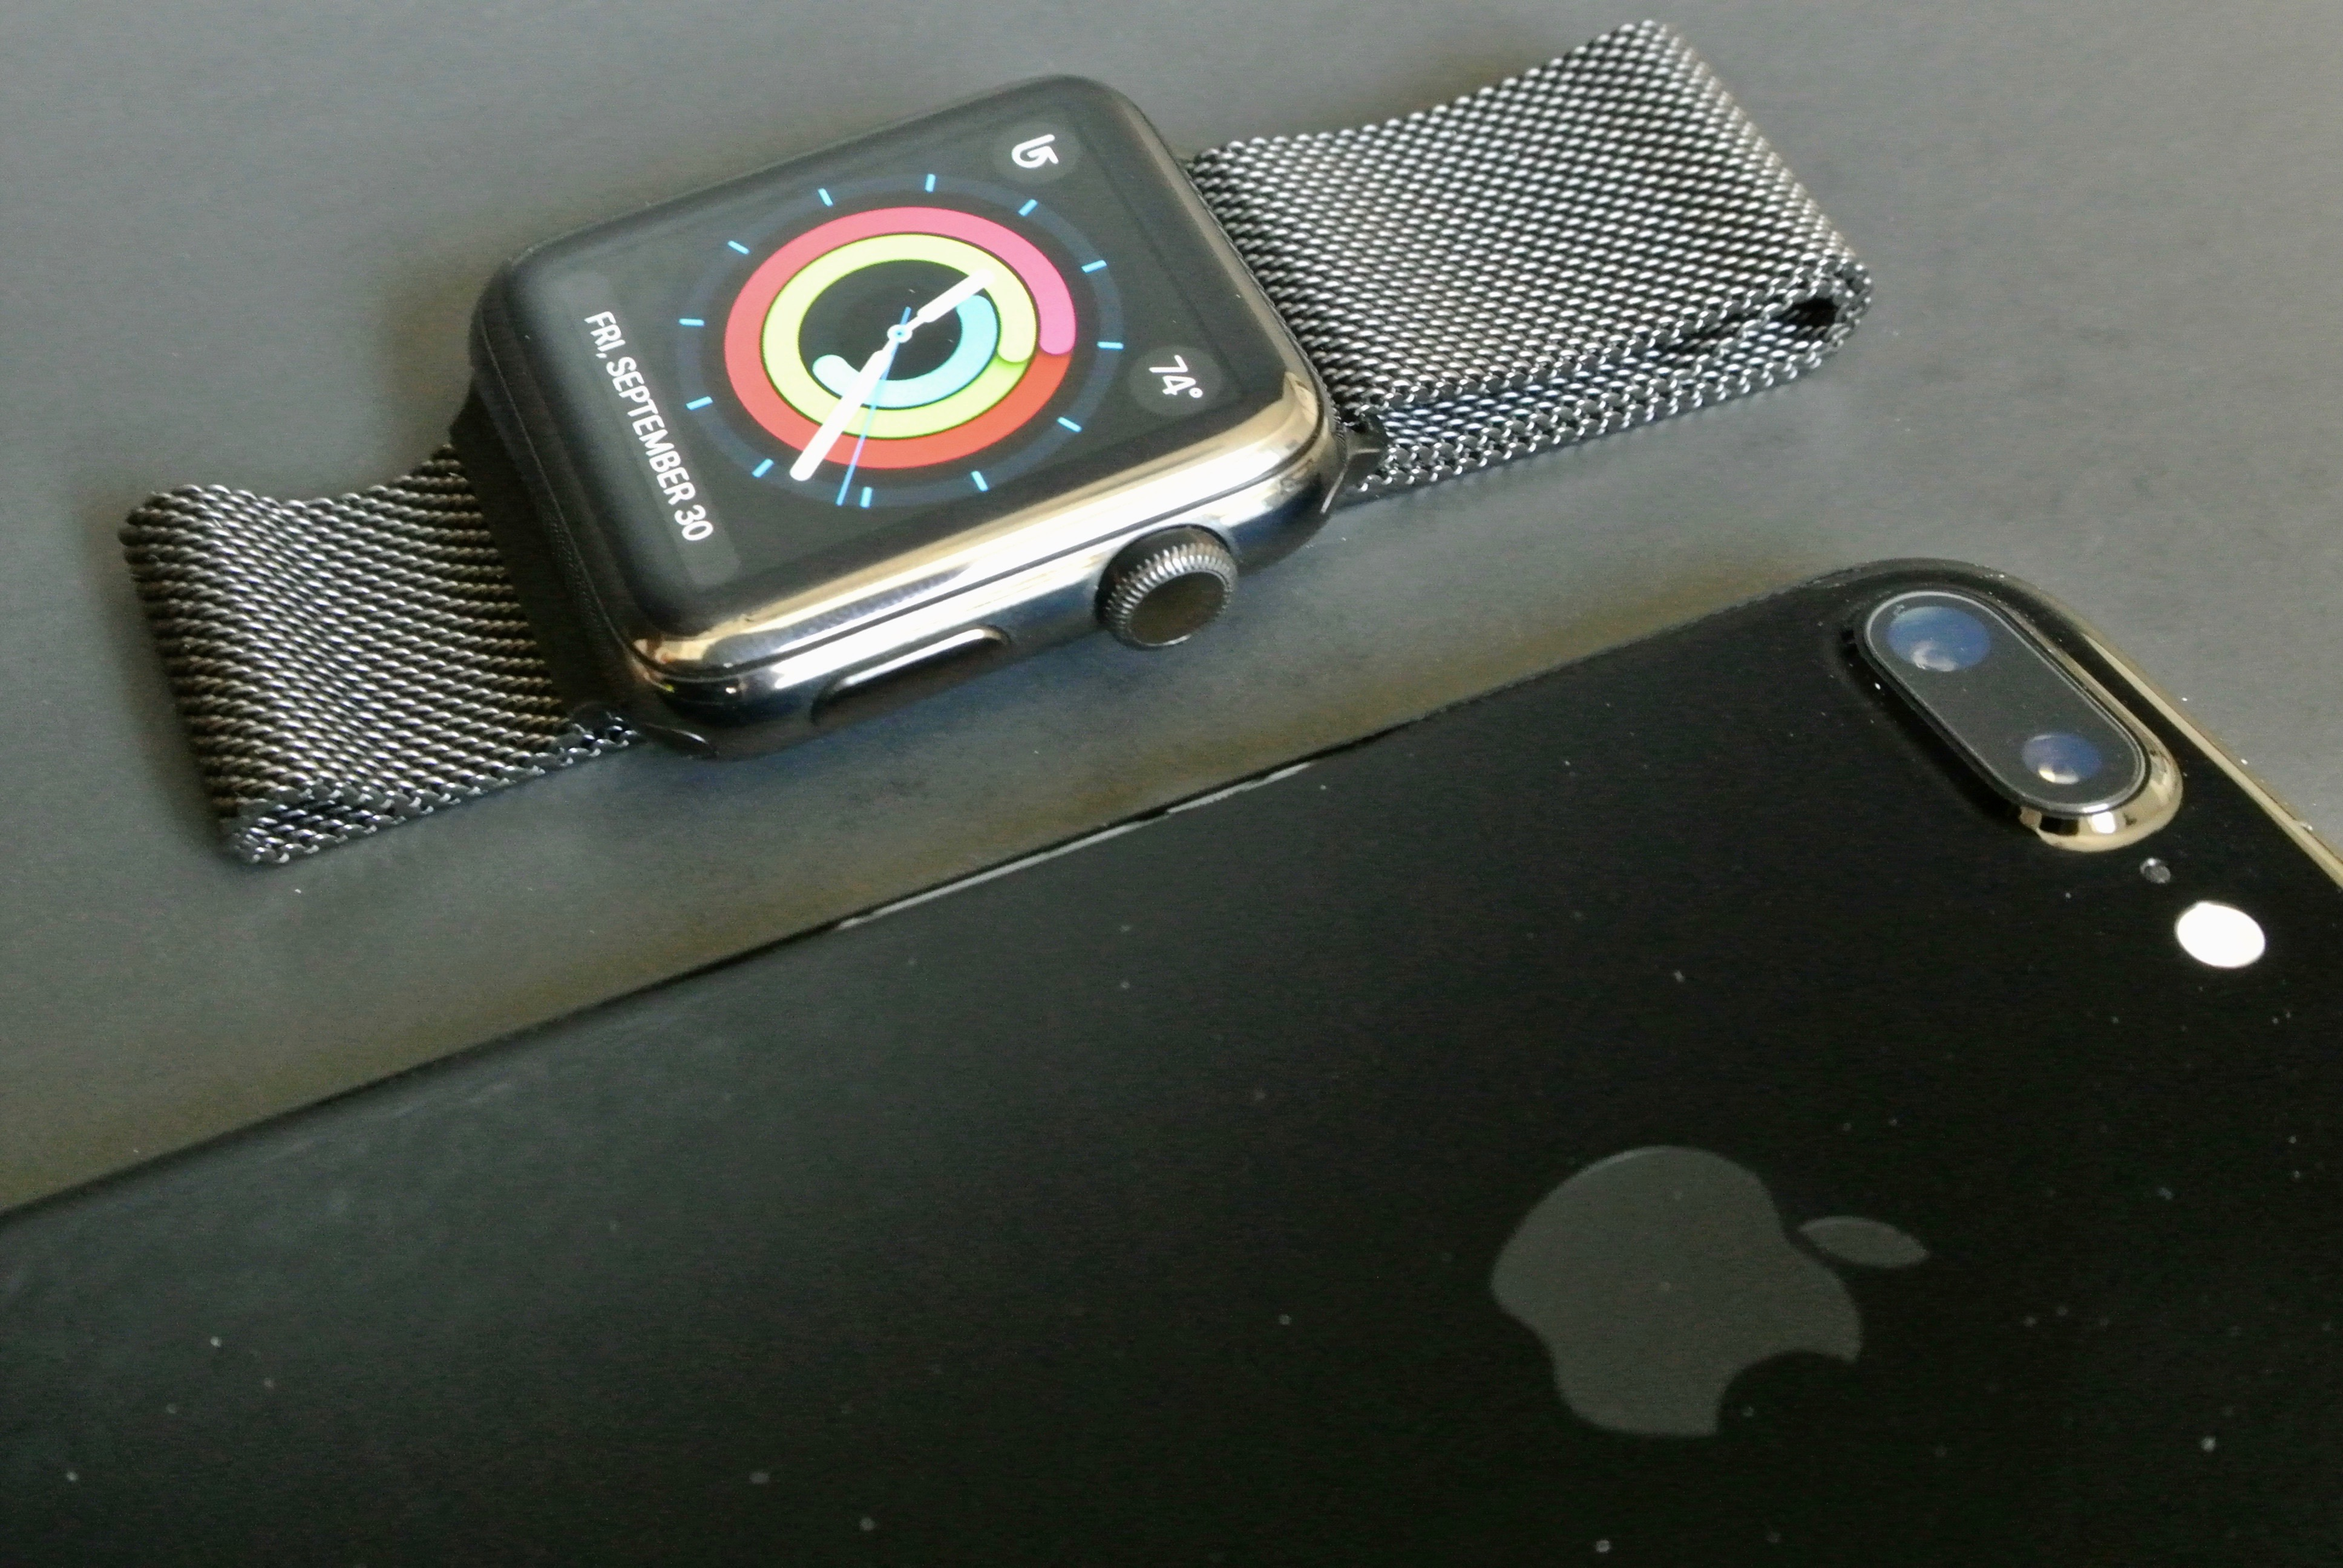 iPhone 7 jet black vs apple watch space black 3